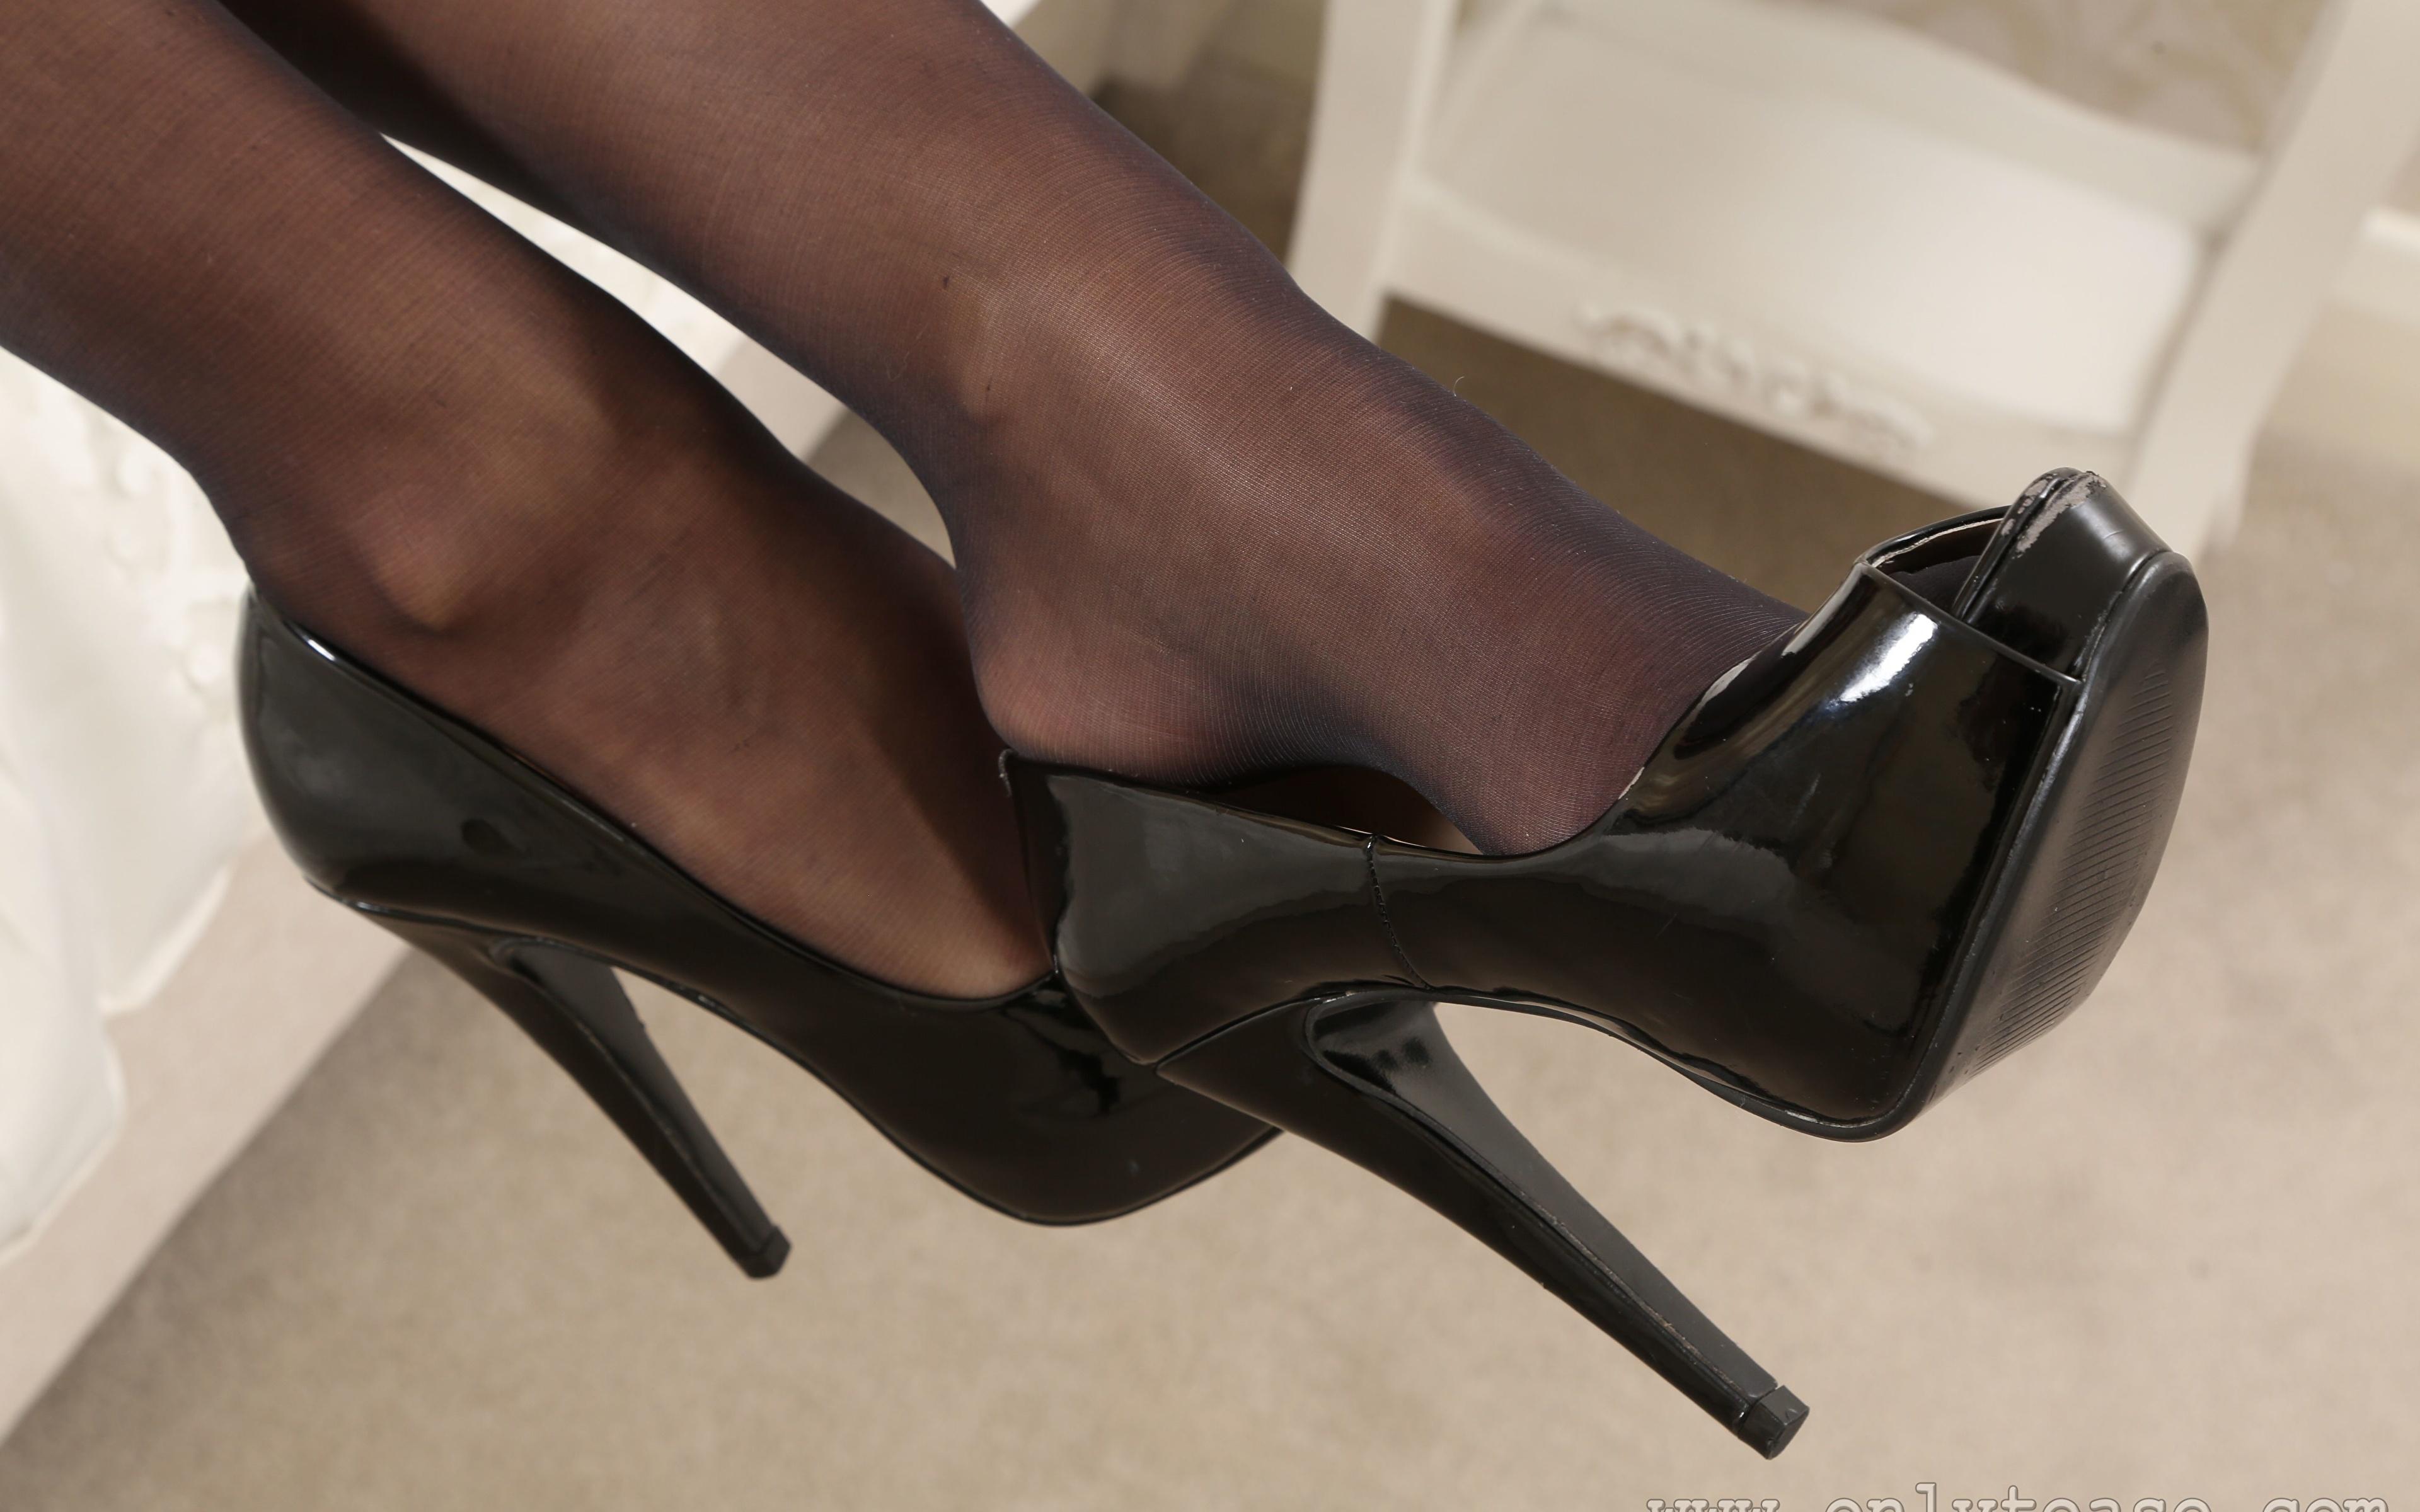 High heels and pantyhose